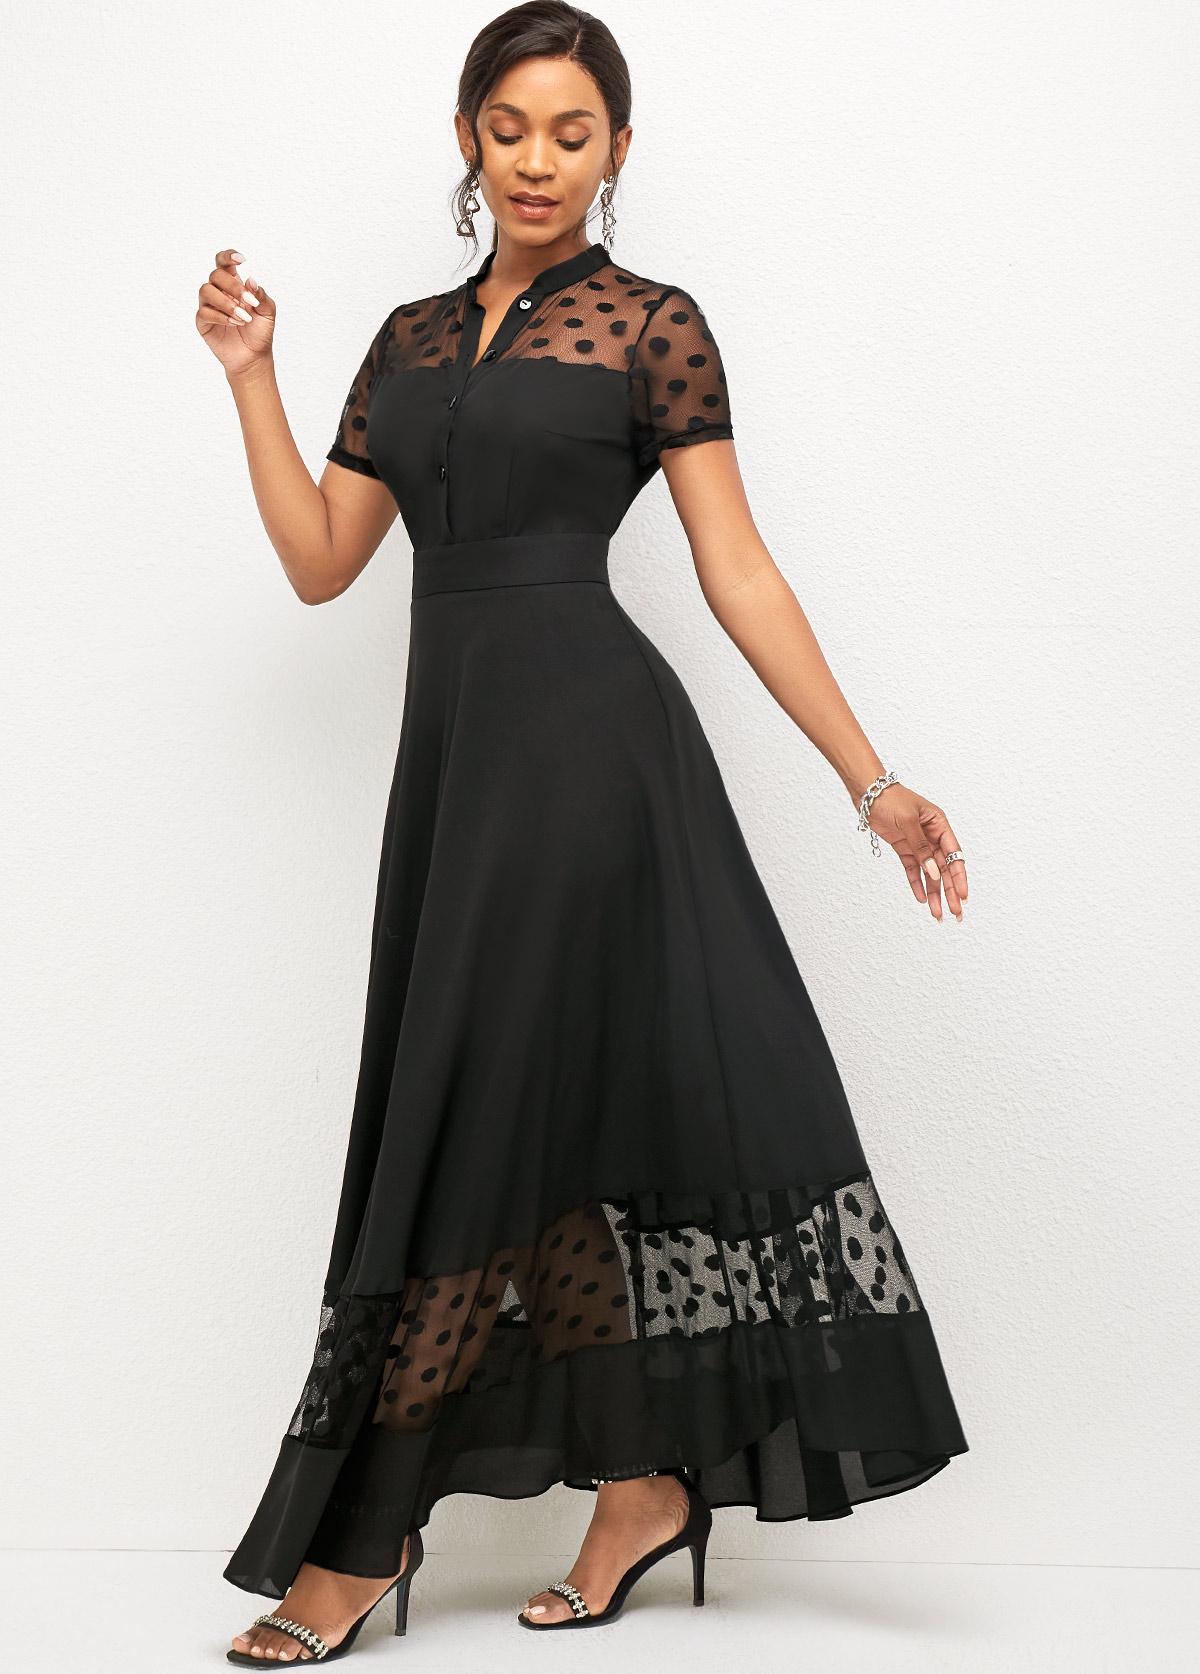 ROTITA Mesh Stitching Polka Dot Short Sleeve Dress